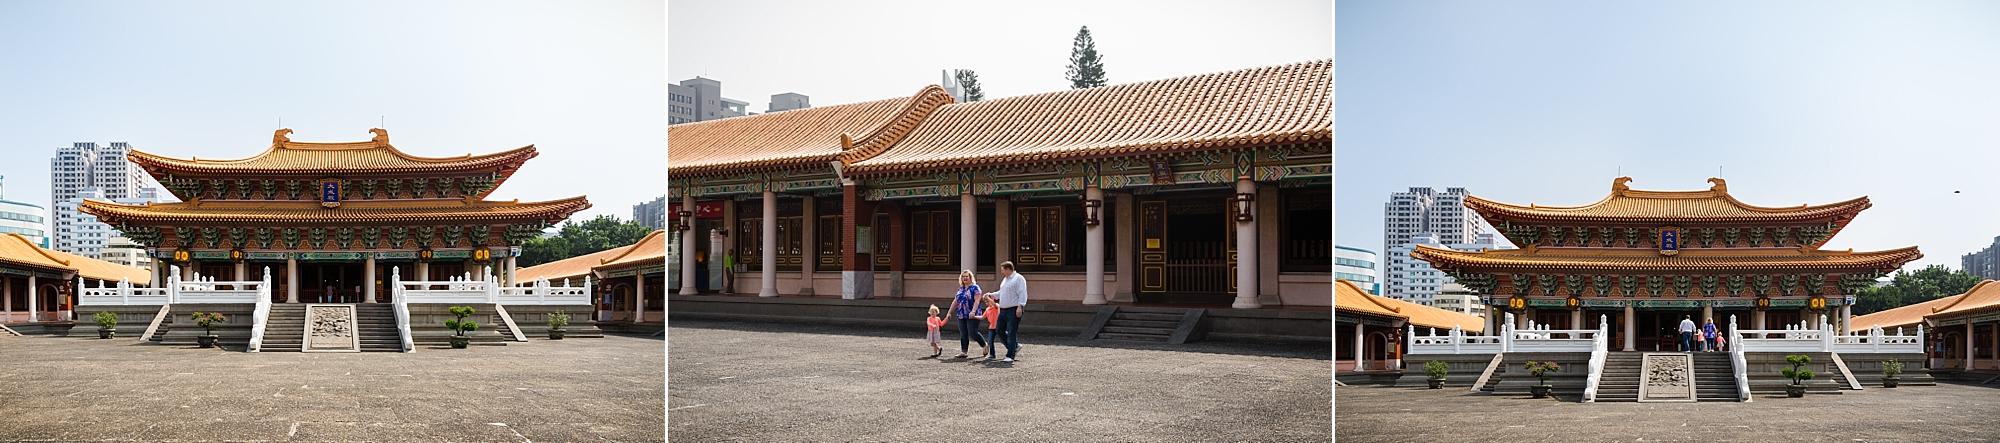 Outdoor_Lifestyle_Family_Photos_Taiwan_Hunnicutt_Photography_0007